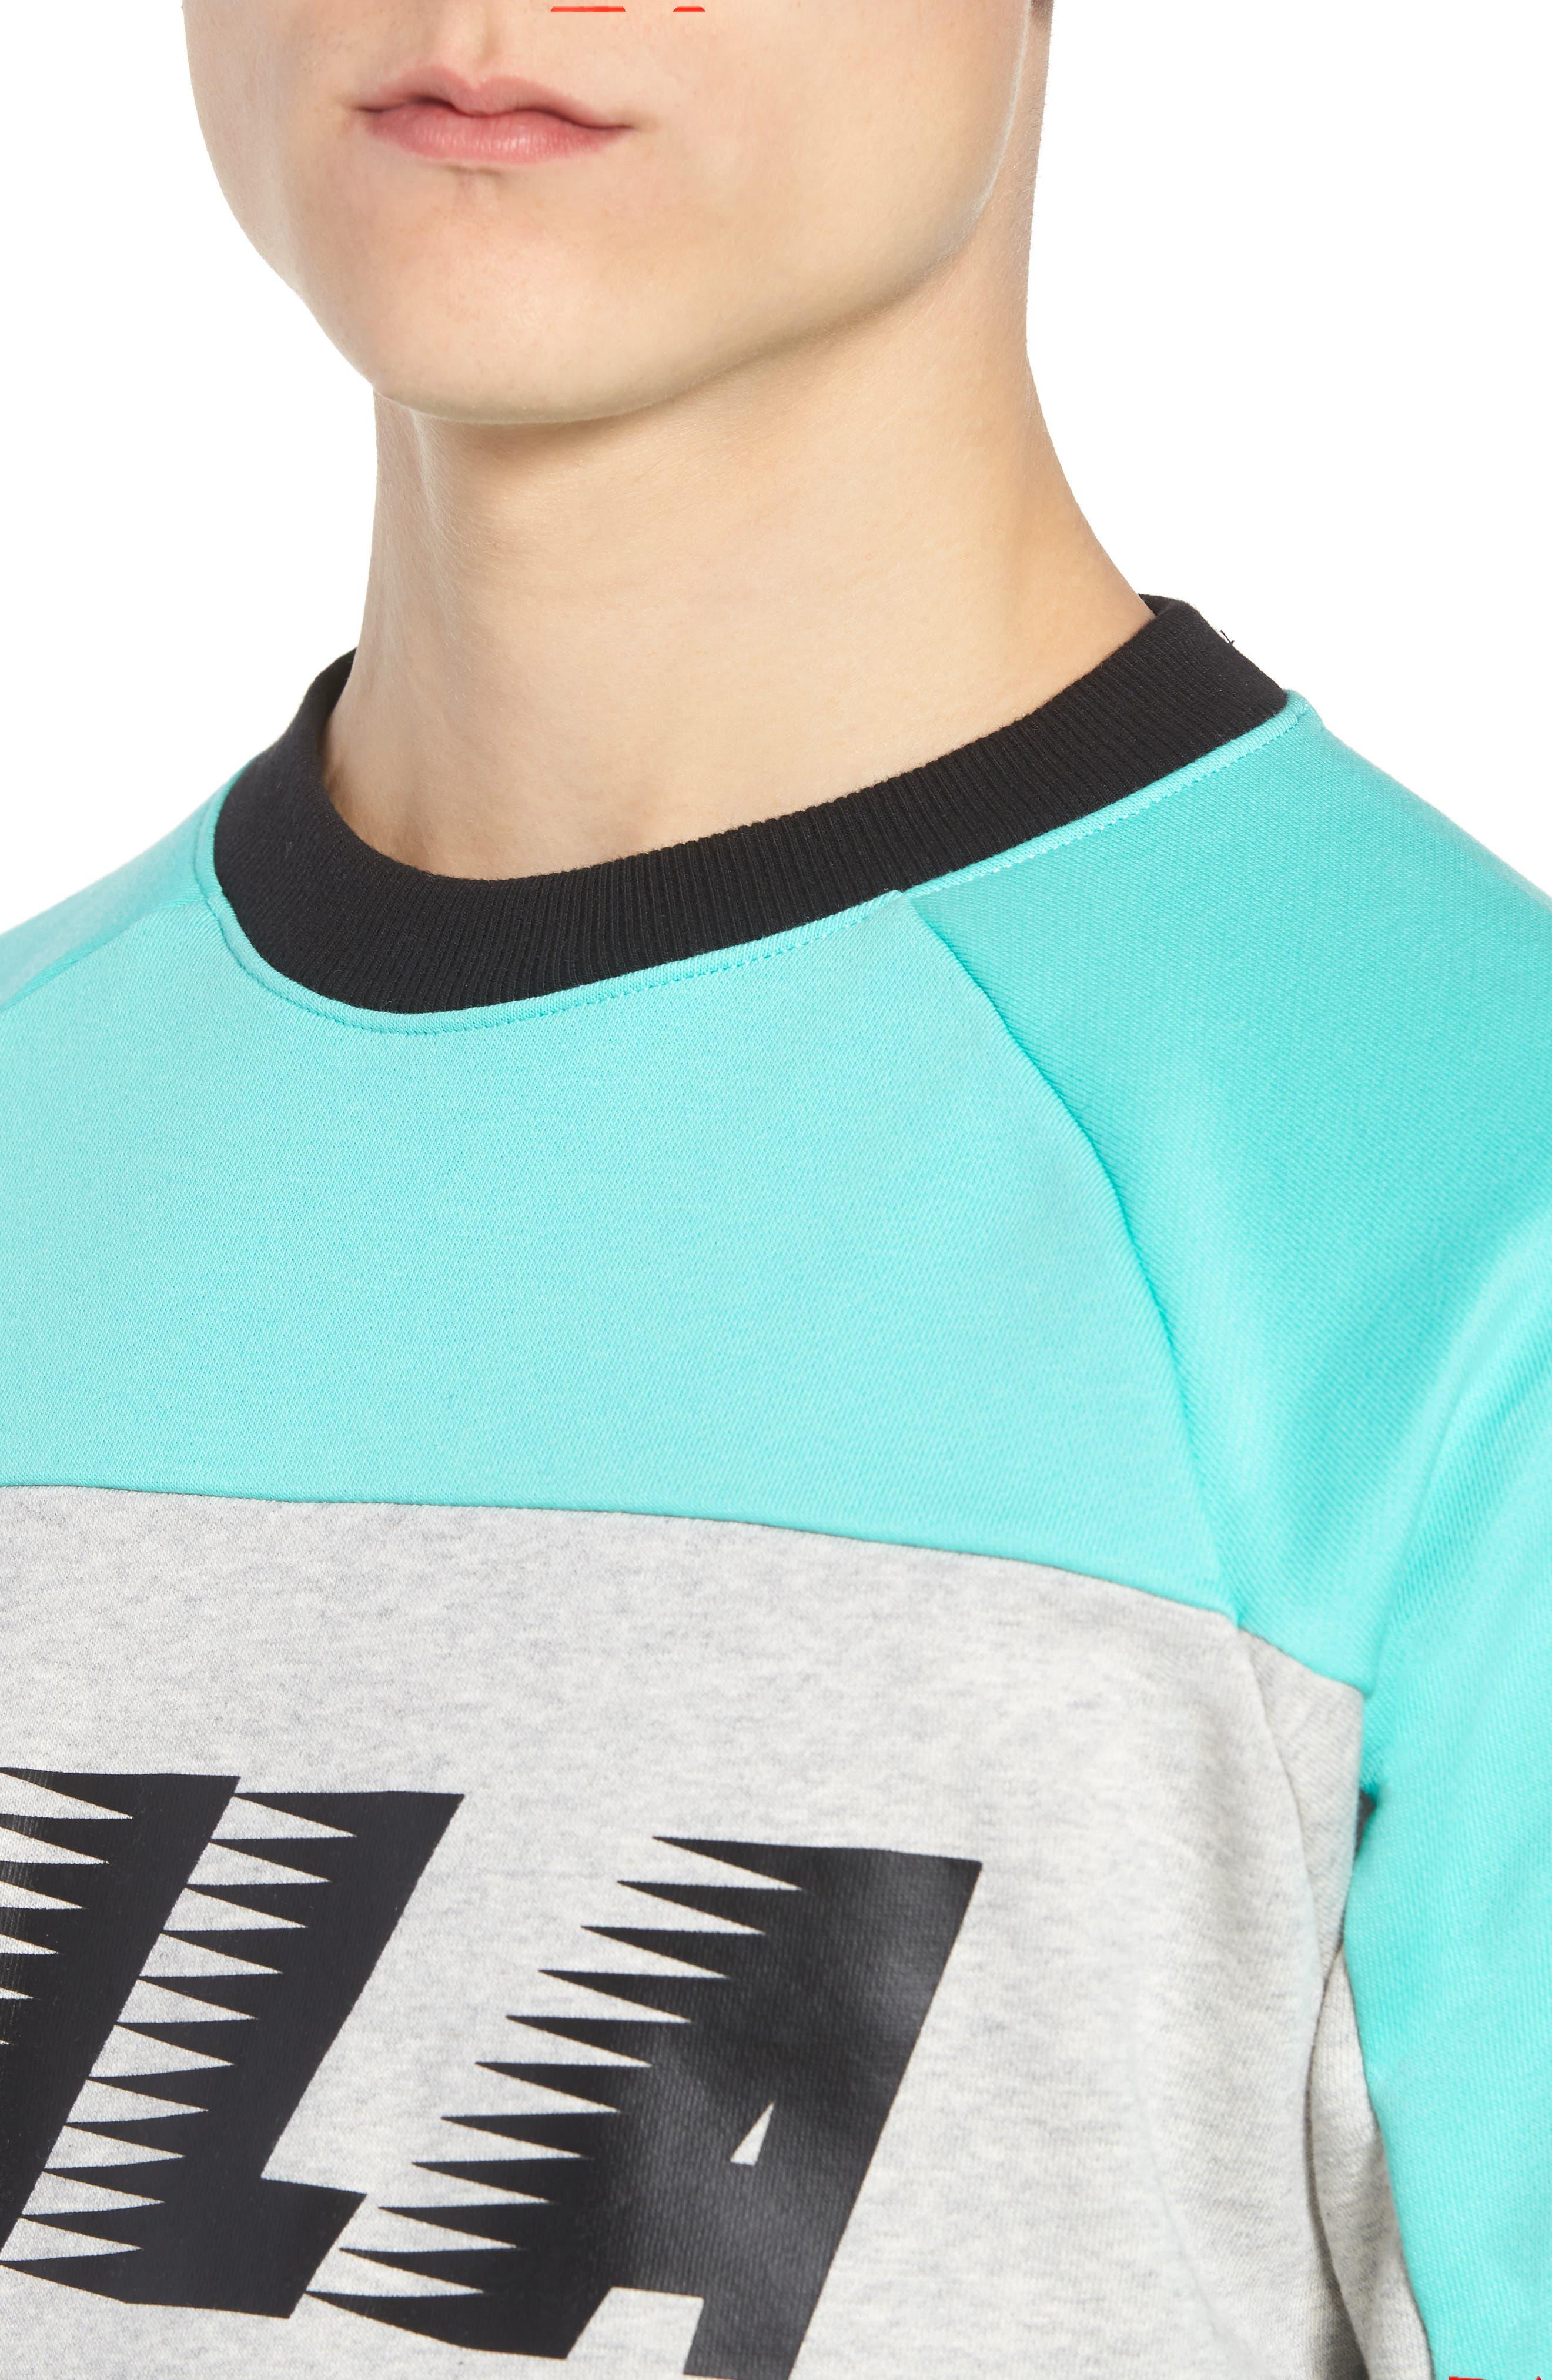 Layton Sweatshirt,                             Alternate thumbnail 4, color,                             Black/ Cockatoo/ Grey Marl